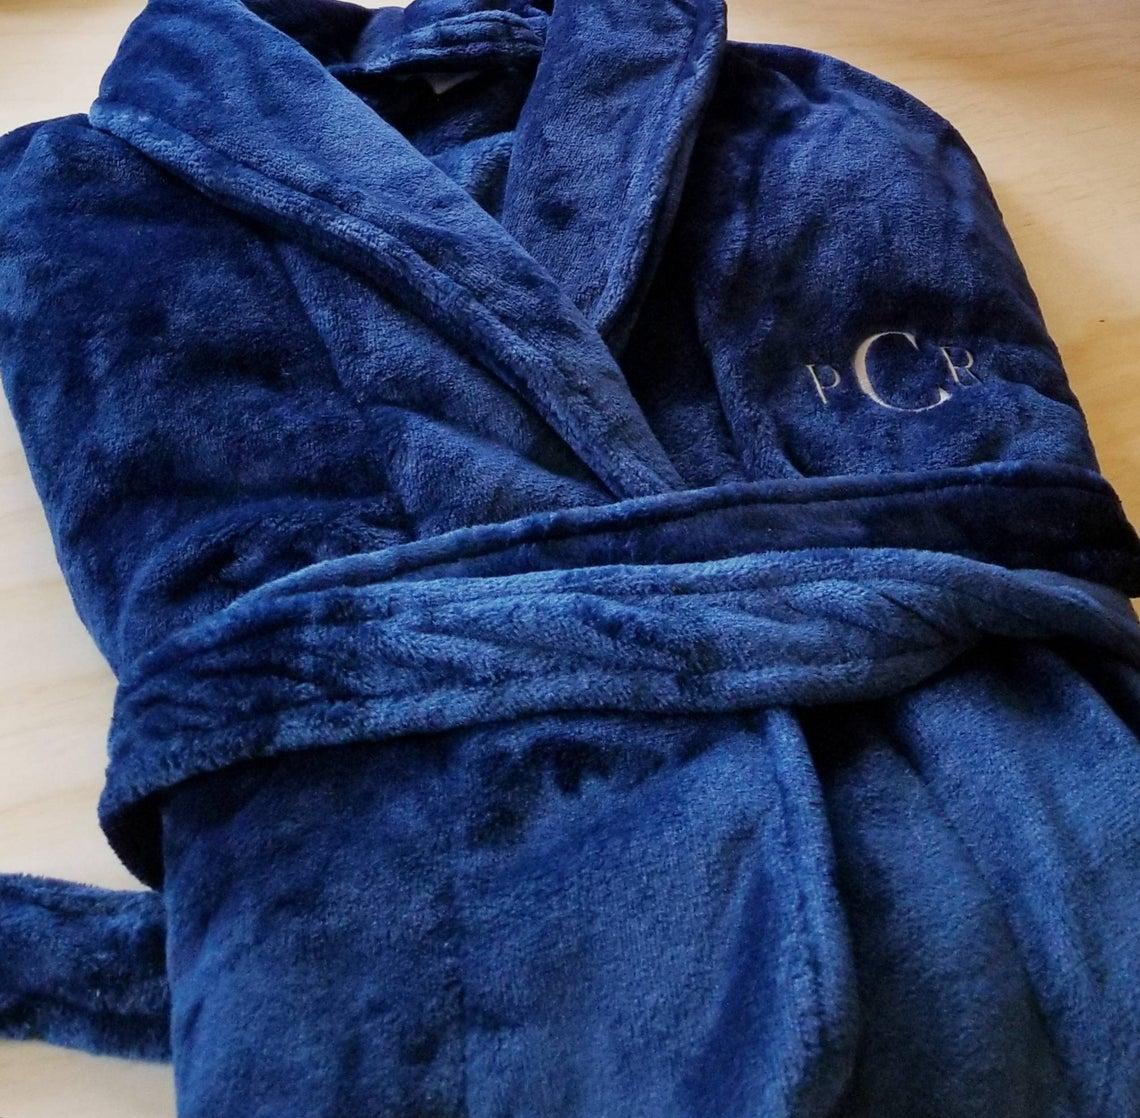 Monogram bathrobe